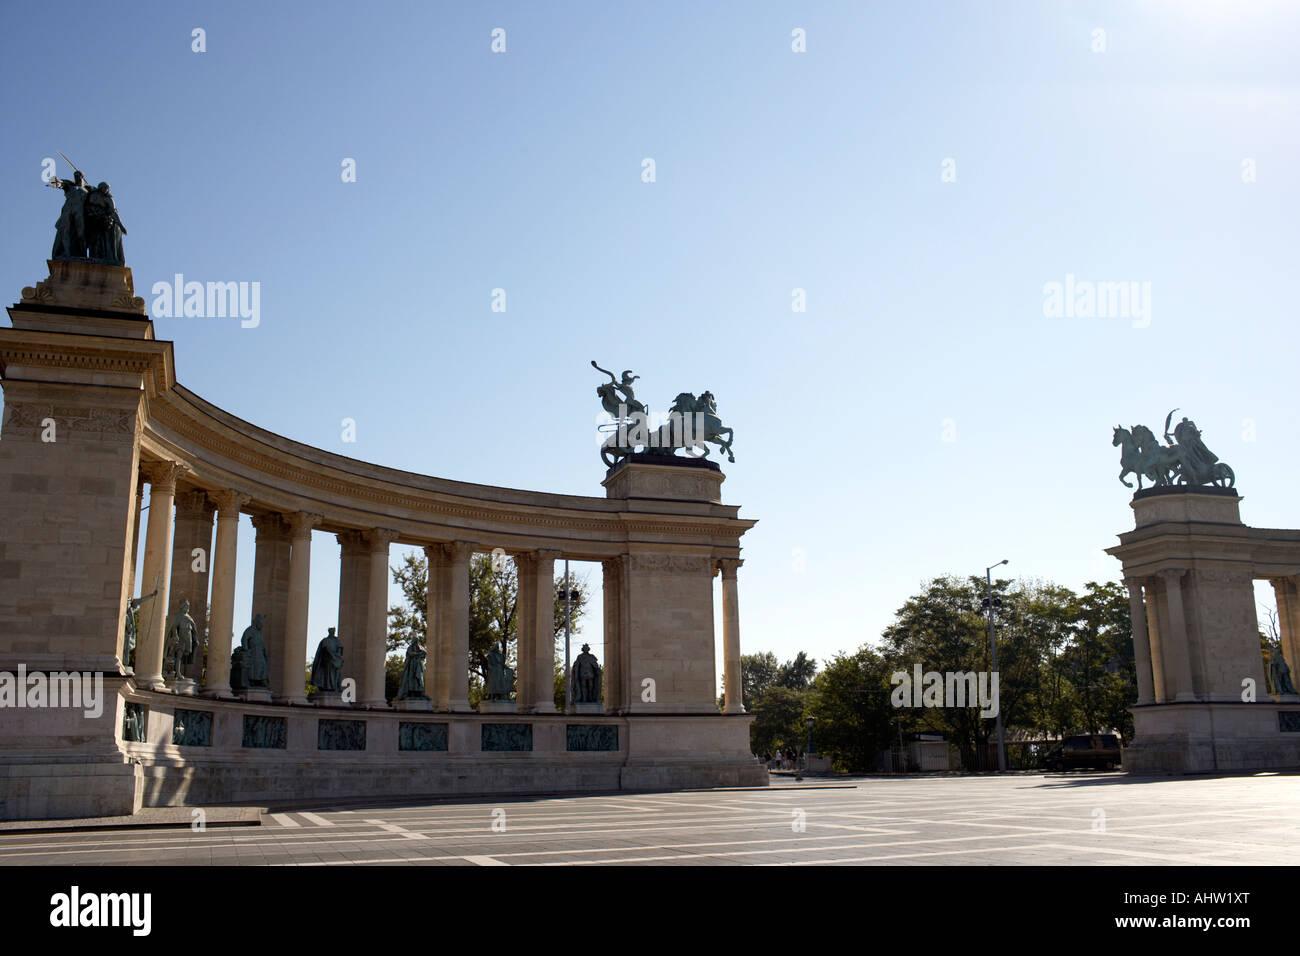 Hero Square in Hungary. - Stock Image